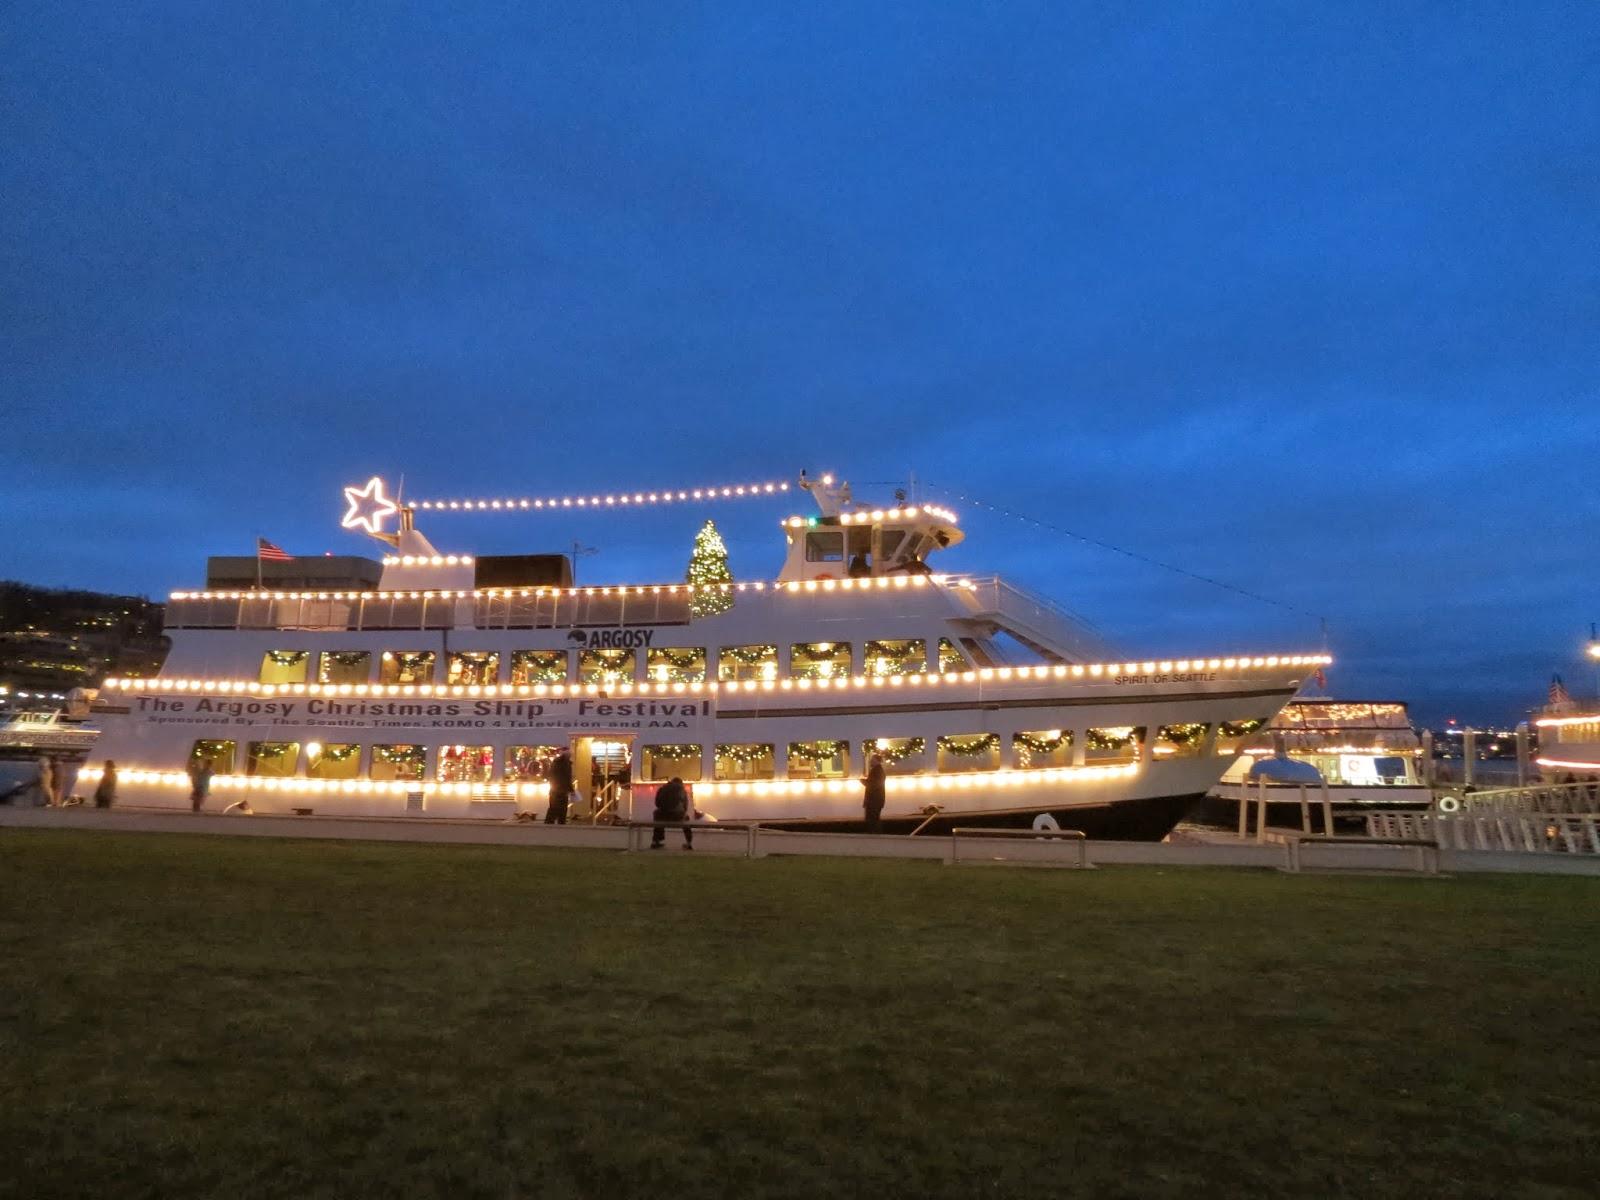 the christmas ship ready to lead the boat parade of lights across lake union - Argosy Christmas Ships 2014